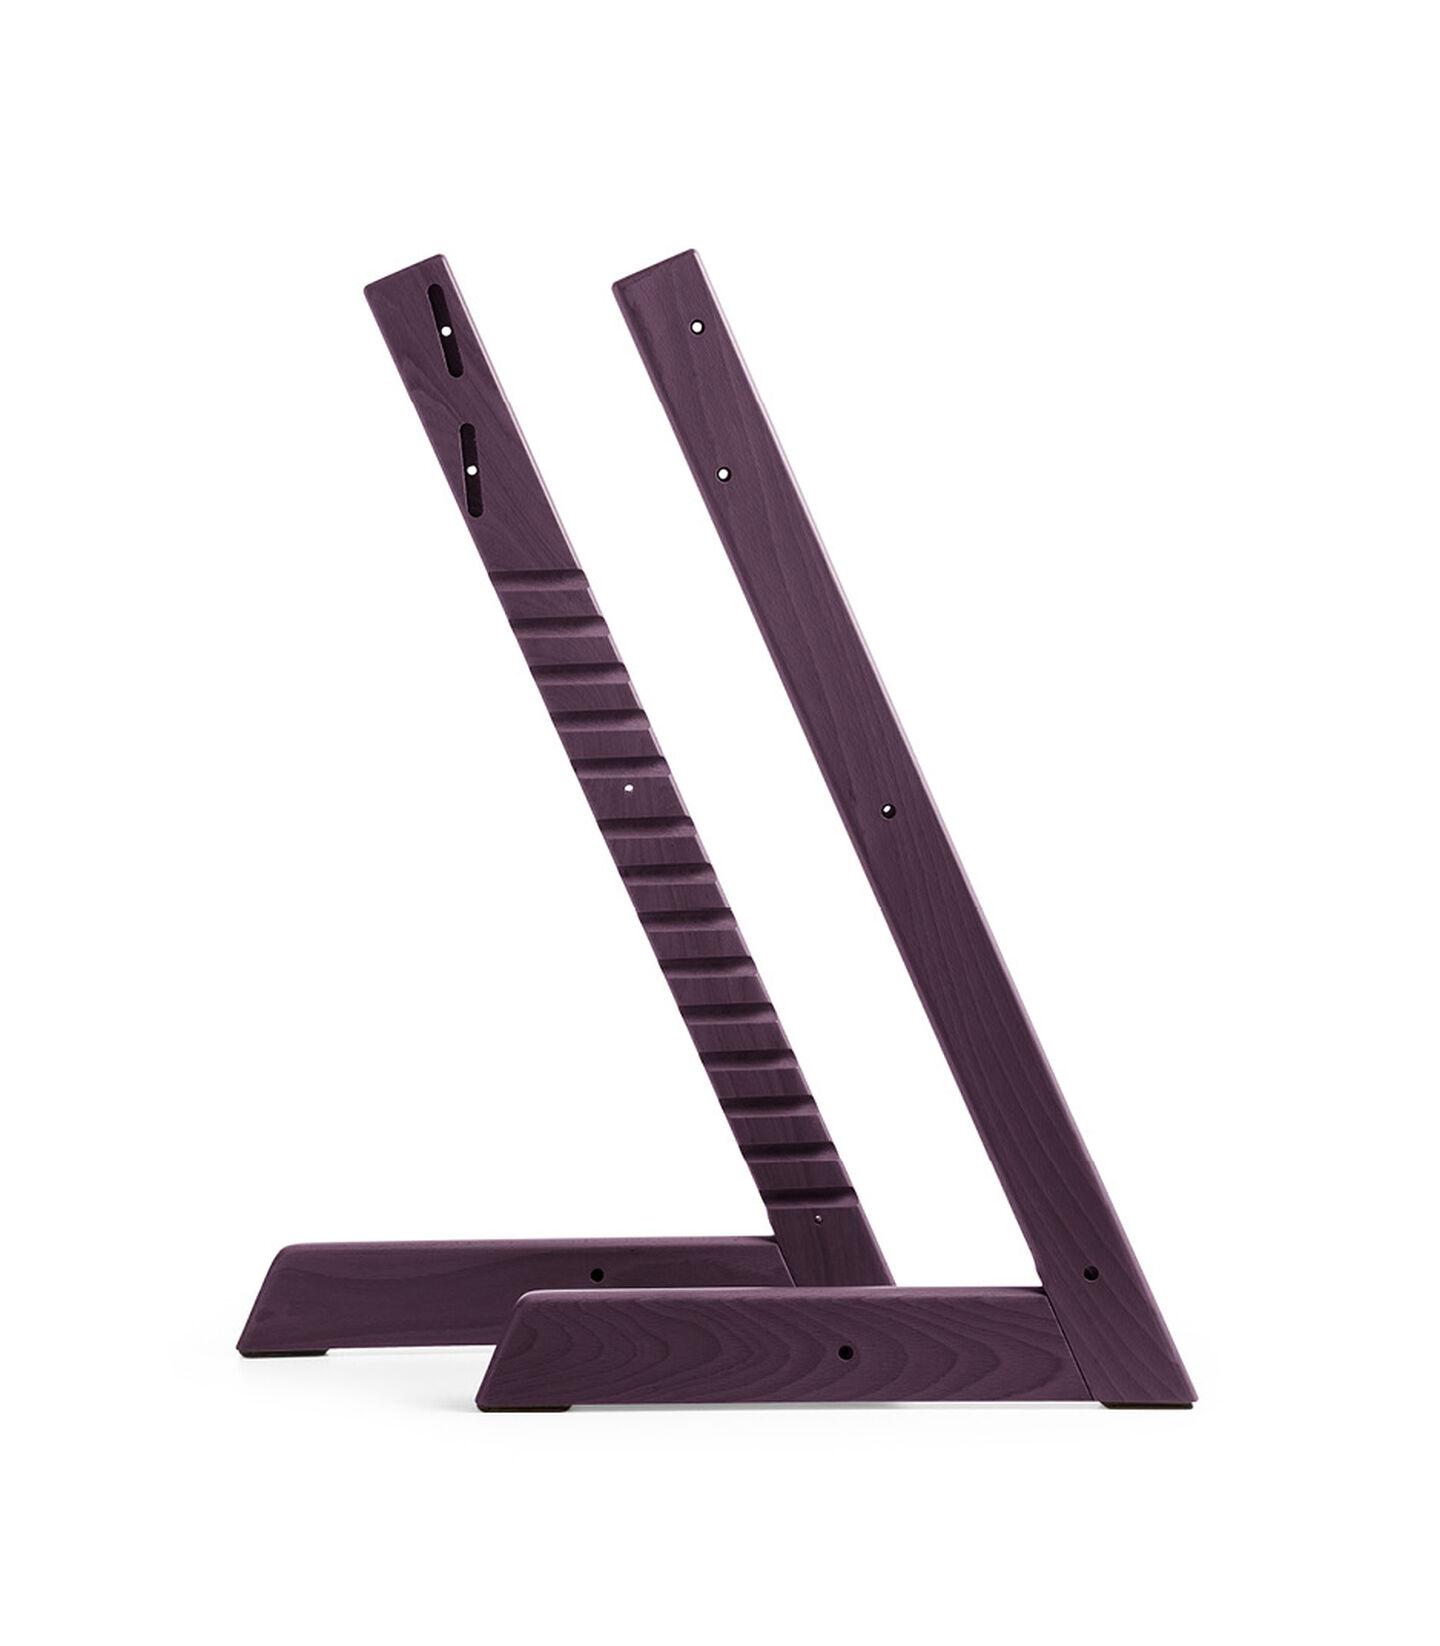 Tripp Trapp® Siderunner set Plum Purple, Prugna, mainview